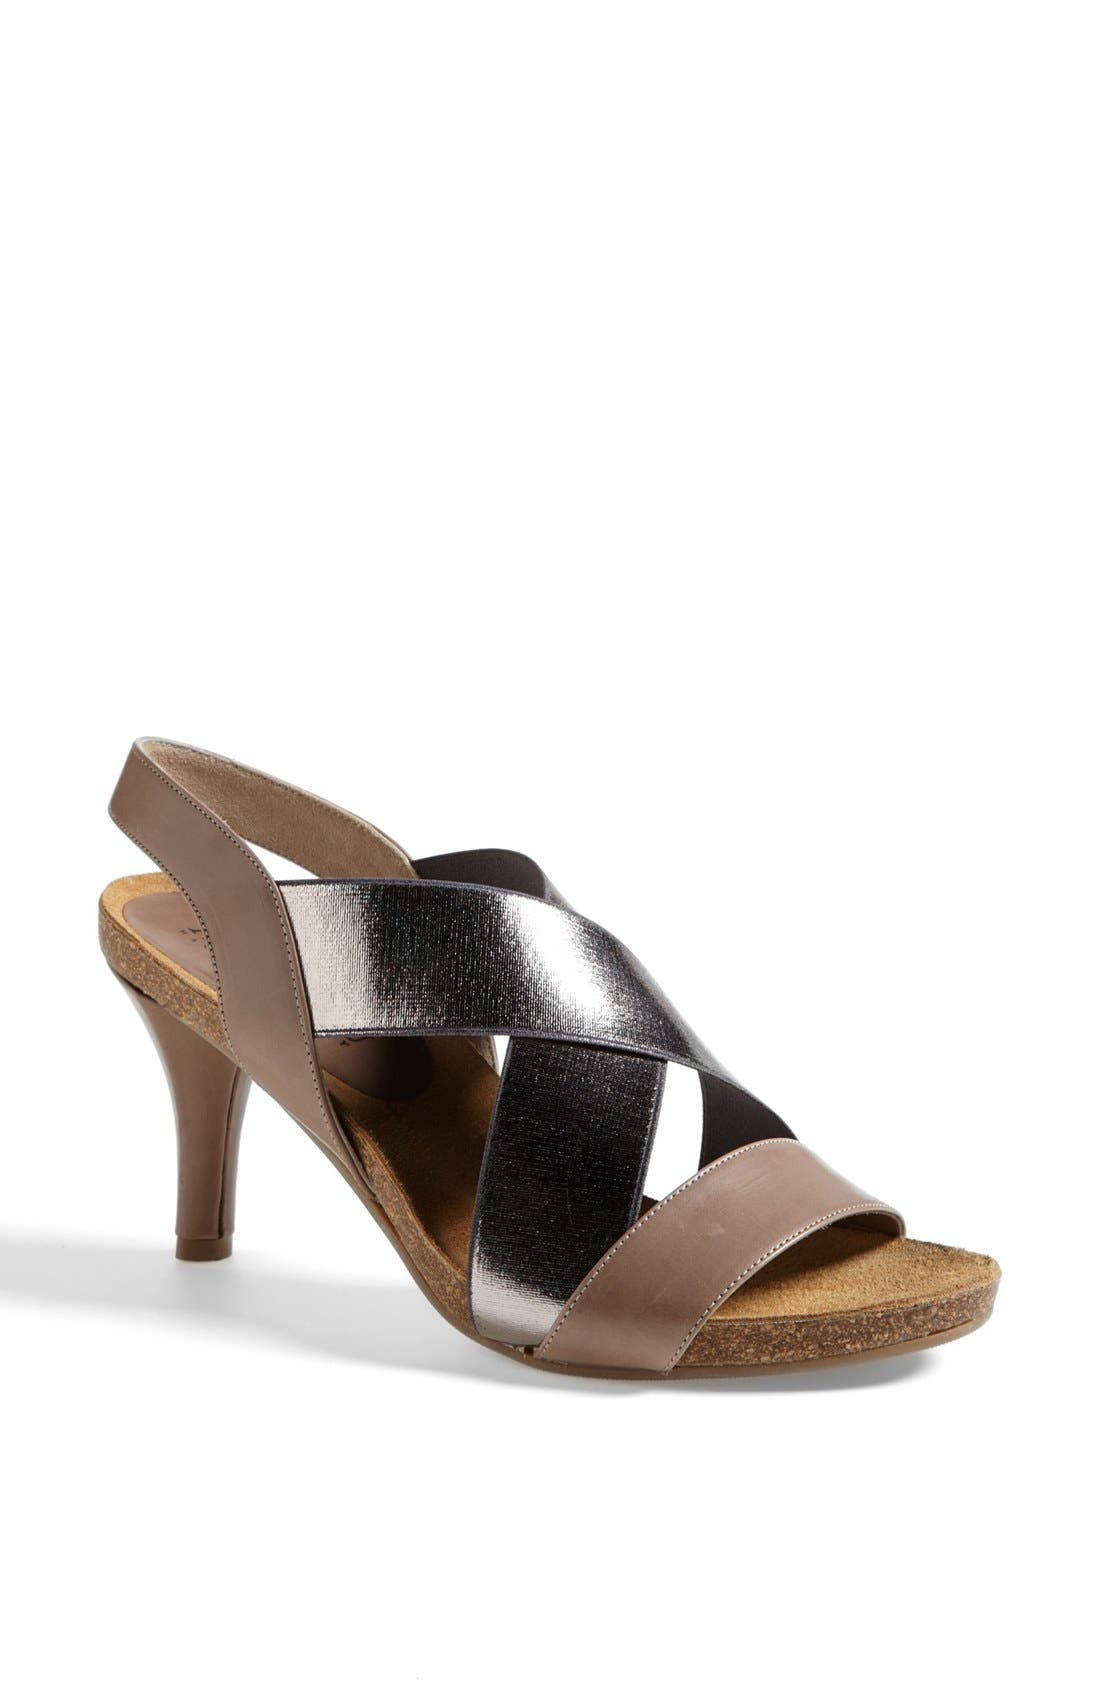 Alternate Image 1 Selected - Anyi Lu 'Bella' Sandal (Women)